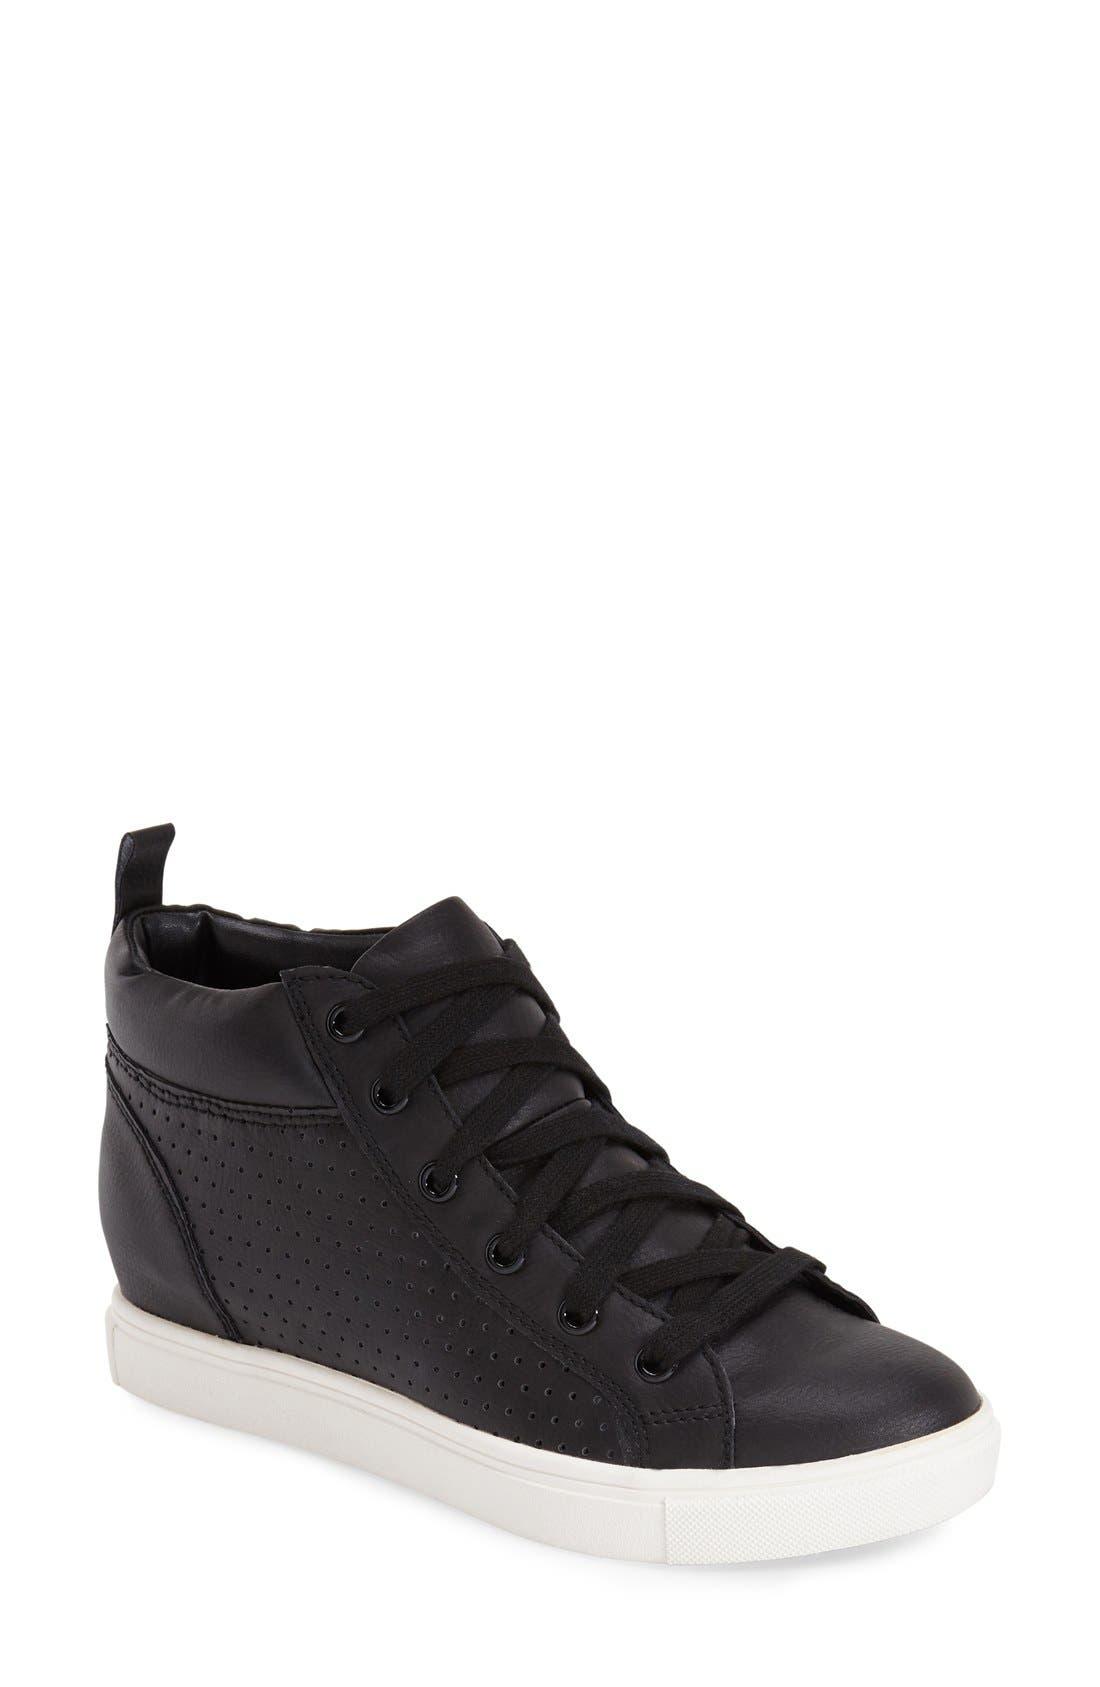 'Latte' Hidden Wedge Sneaker,                             Main thumbnail 1, color,                             005